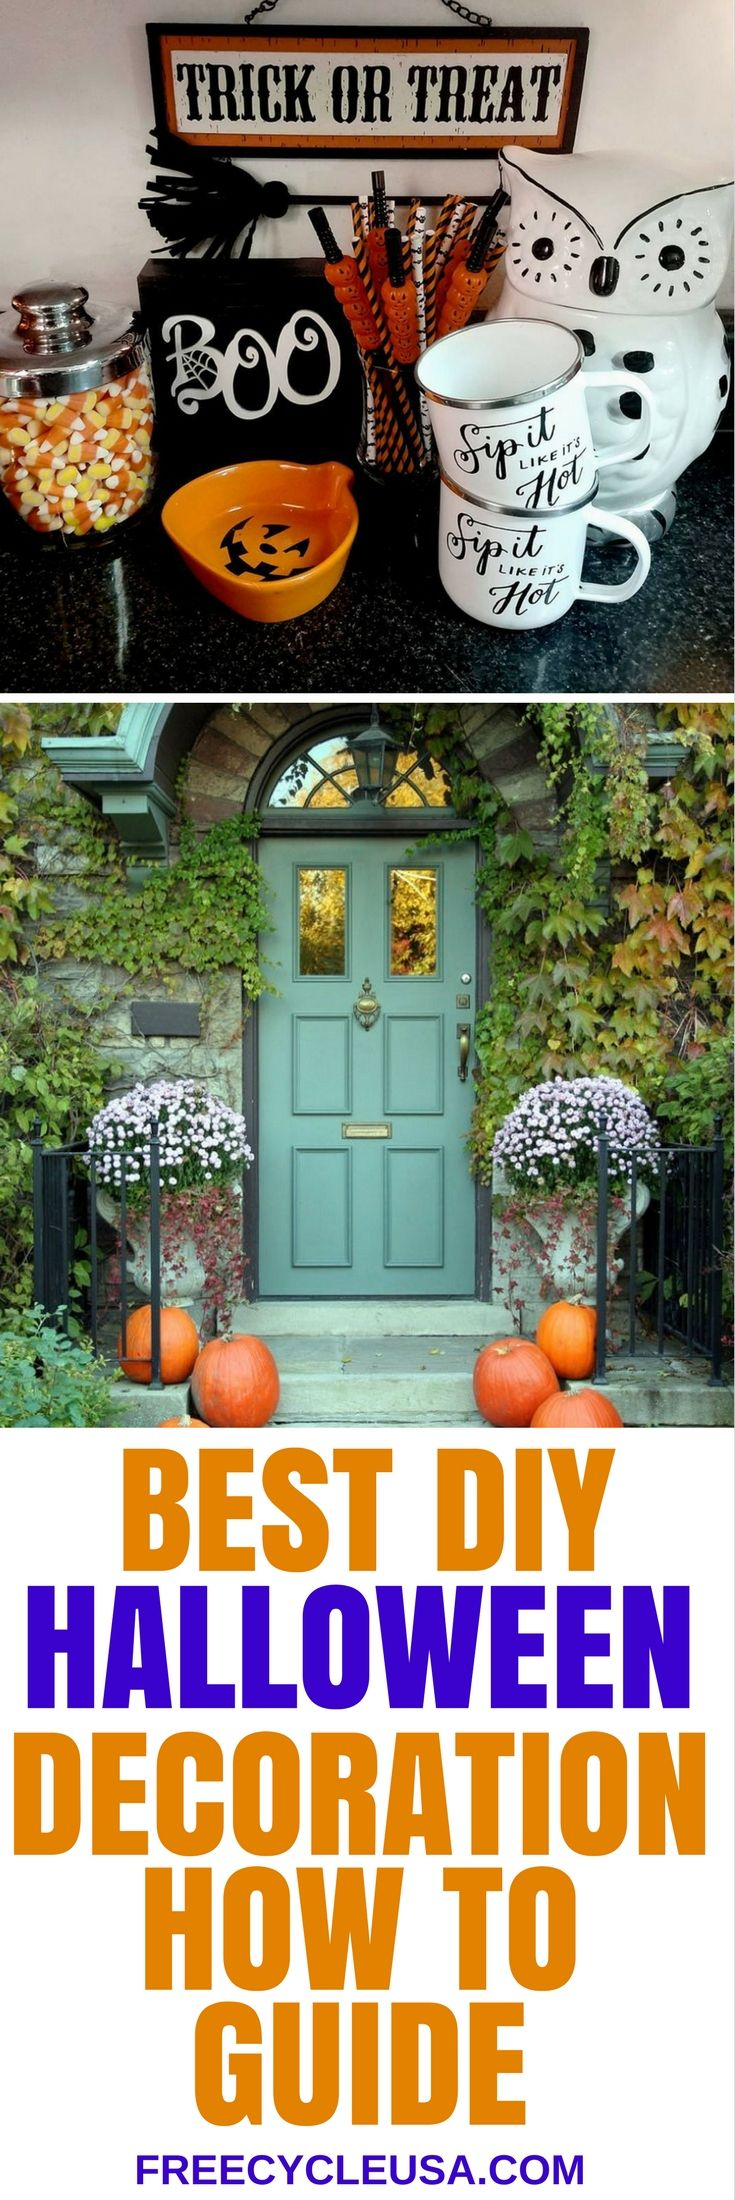 5 Best Halloween Decoration Ideas For 2017. Halloween GarlandDiy Halloween  DecorationsHalloween CraftsDeco MeshHalloween 2017FestiveGarlandsWreathsDoor  ...